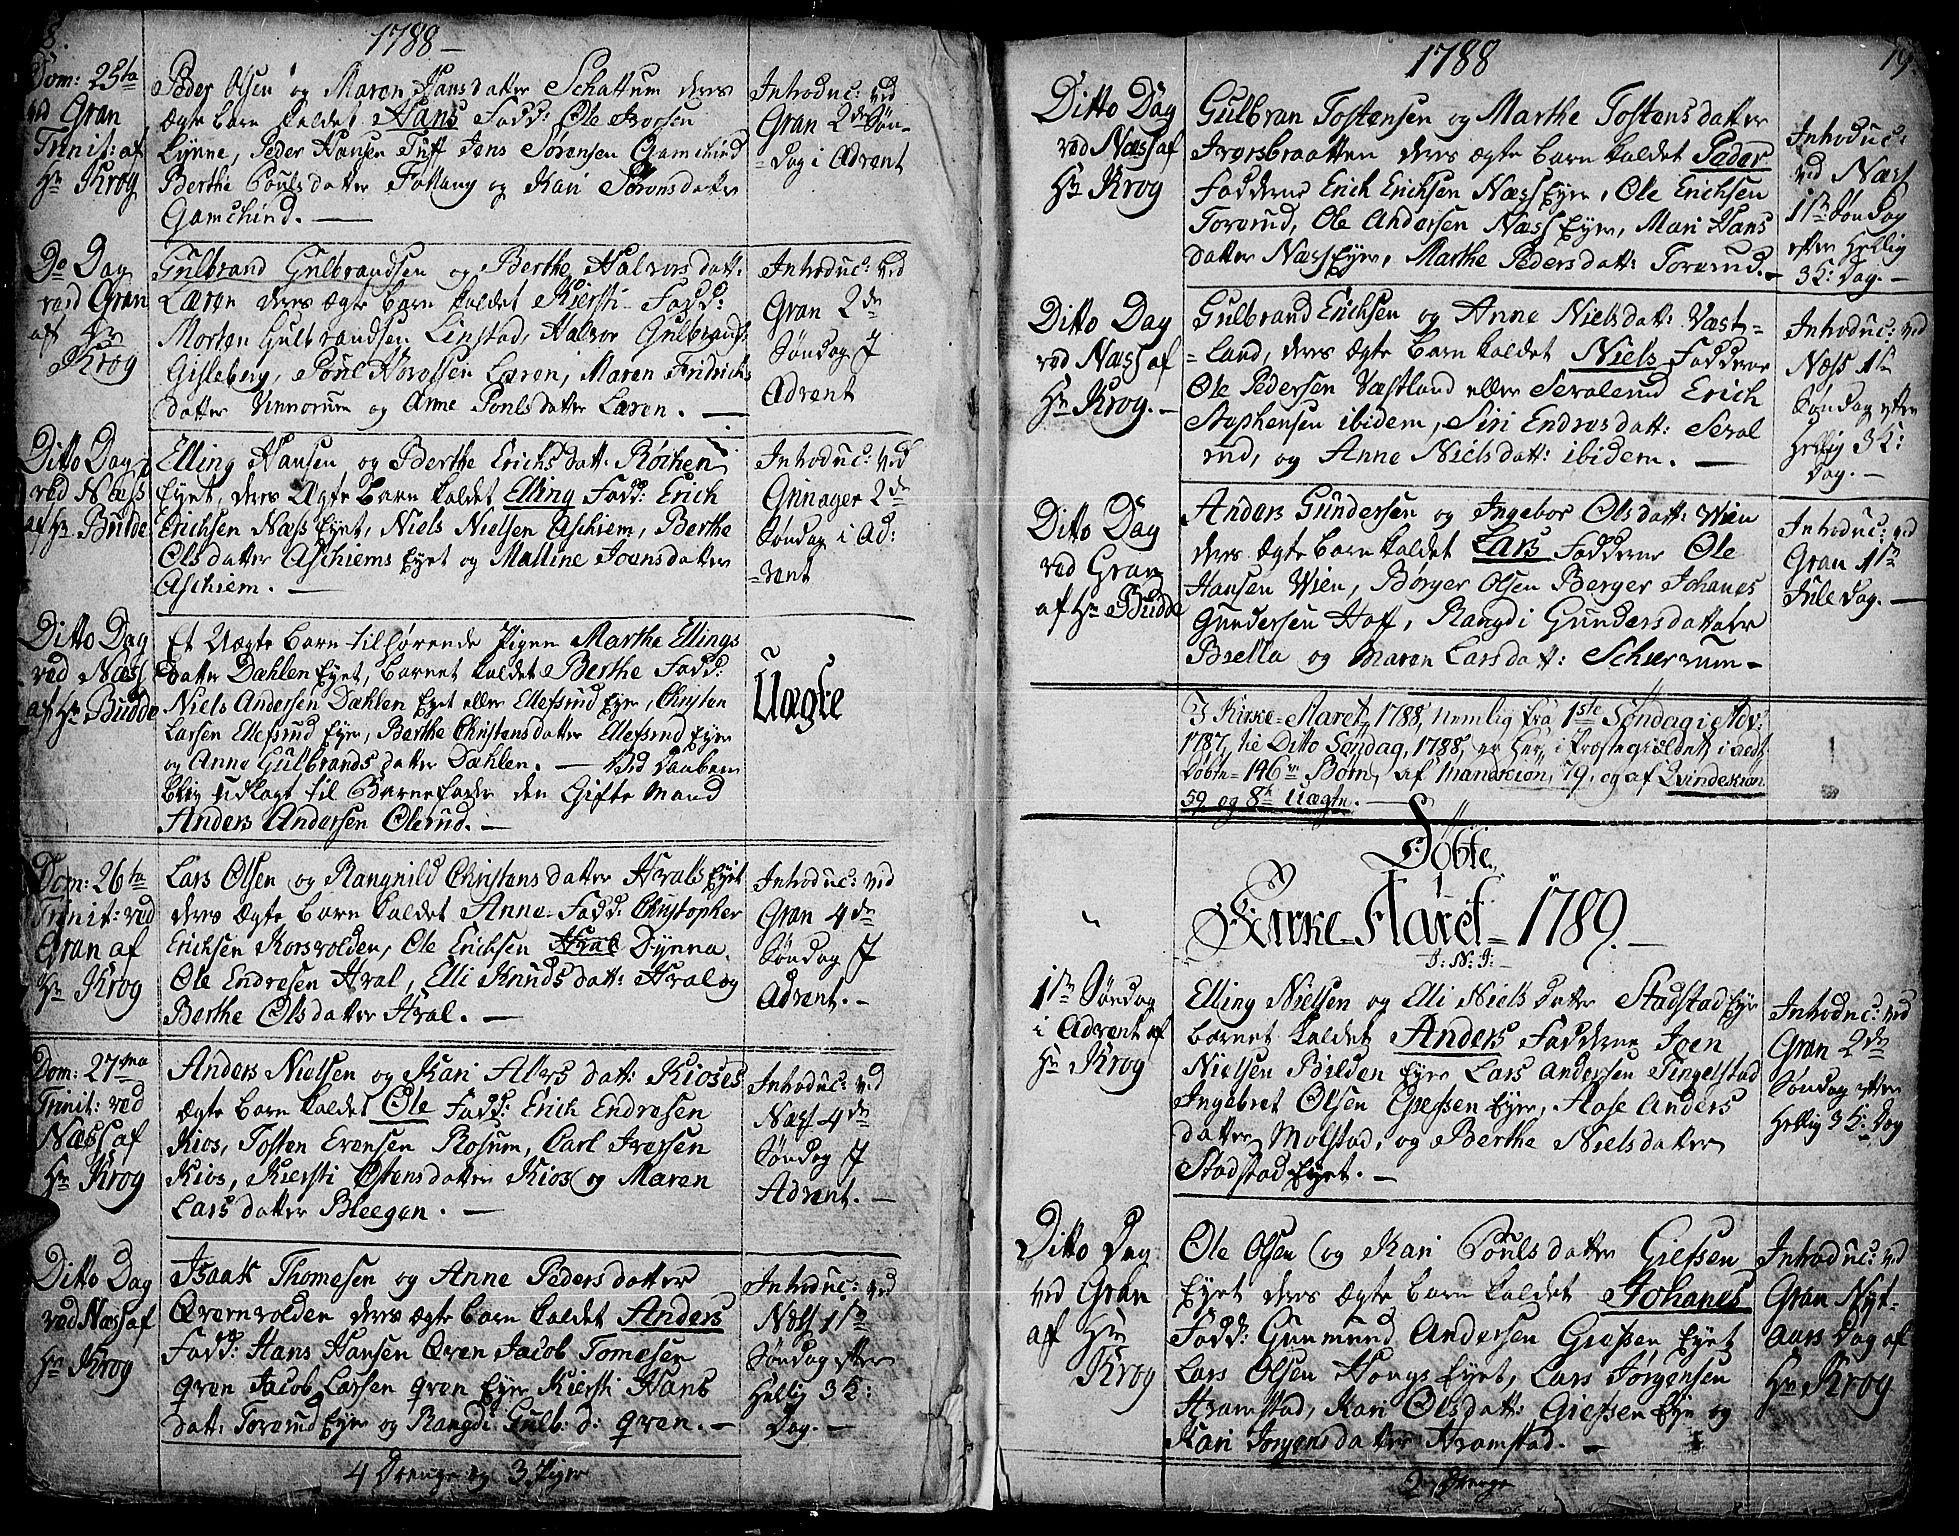 SAH, Gran prestekontor, Ministerialbok nr. 6, 1787-1824, s. 18-19